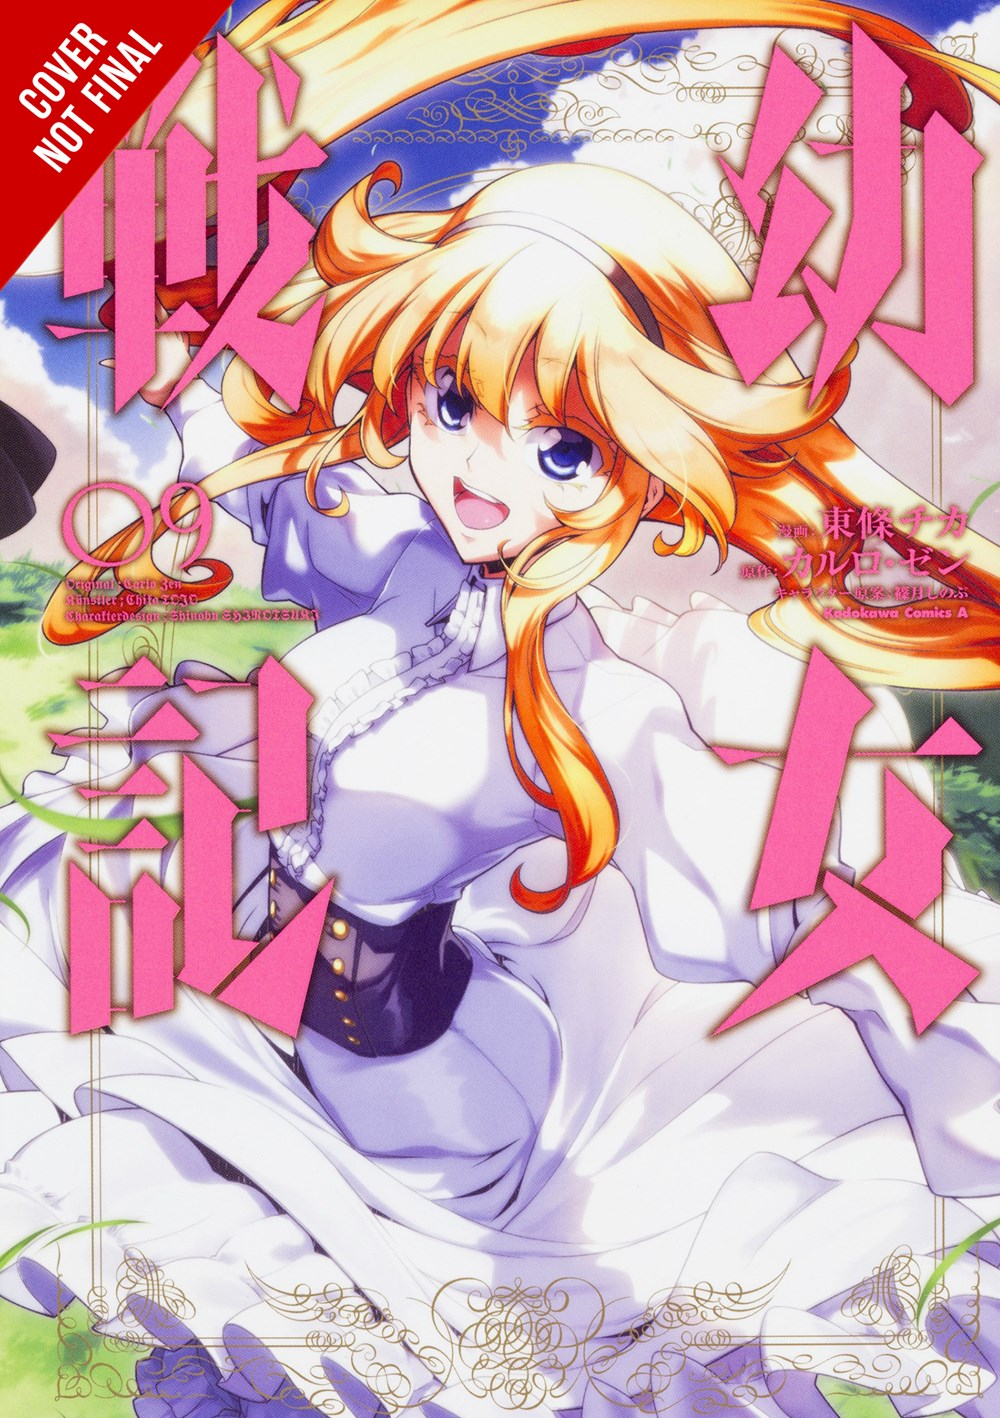 The Saga of Tanya the Evil Manga Volume 9